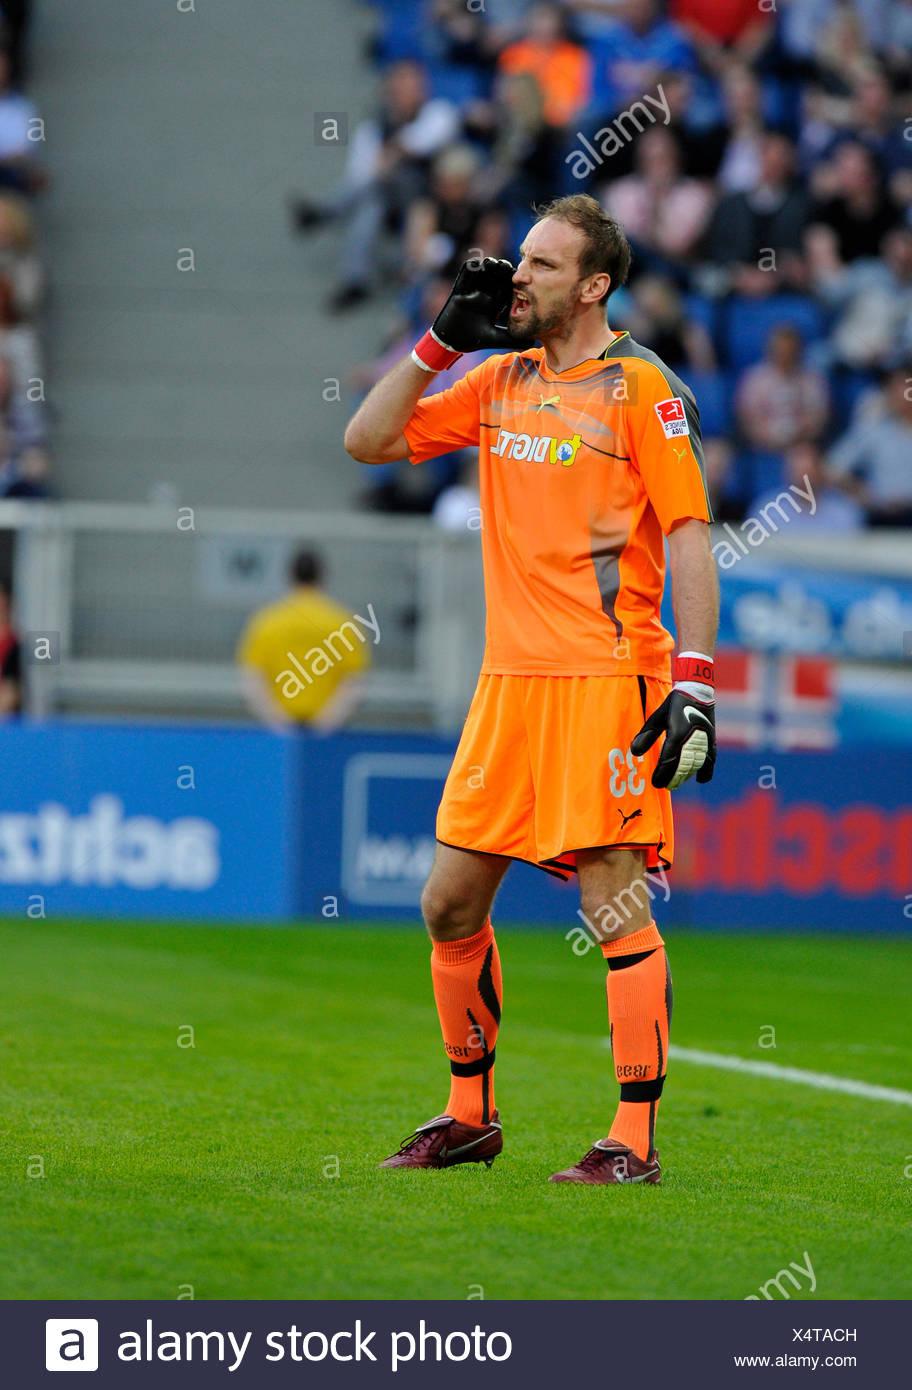 Goalkeeper Tom Starke, TSG 1899 Hoffenheim, loudly instructing the defense Stock Photo